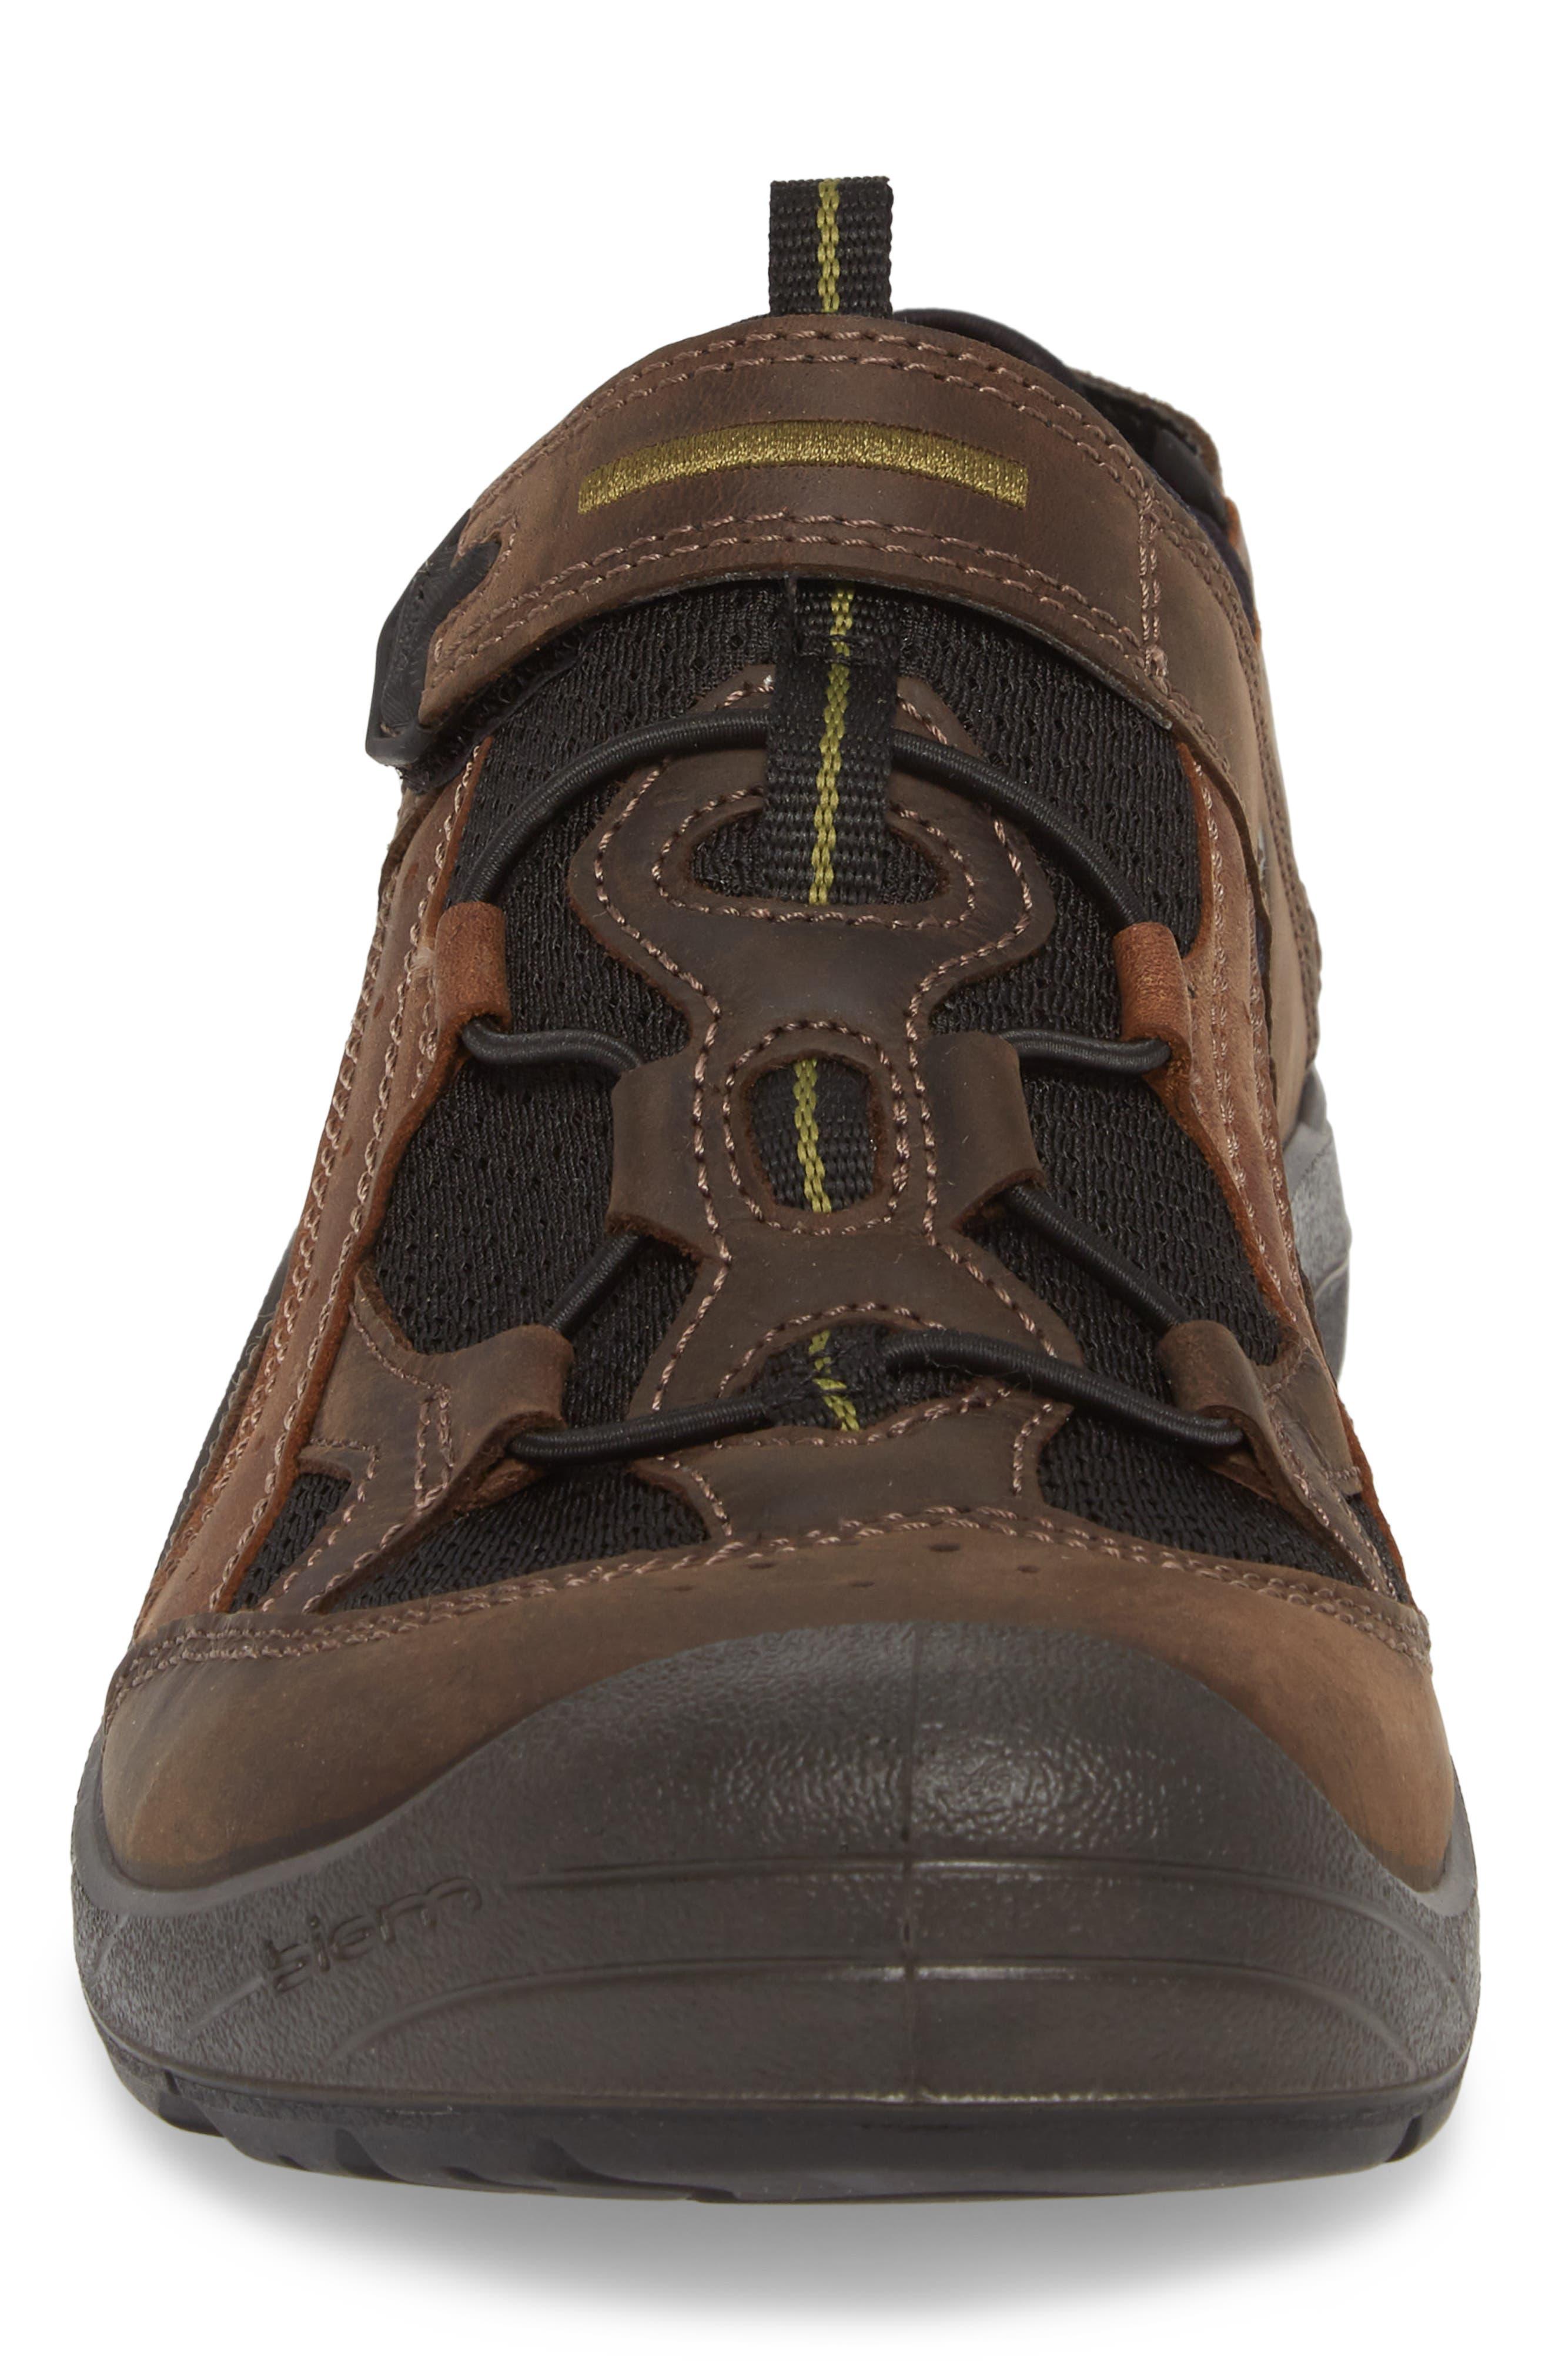 BIOM Delta Fisherman Sandal,                             Alternate thumbnail 4, color,                             Coffee Leather